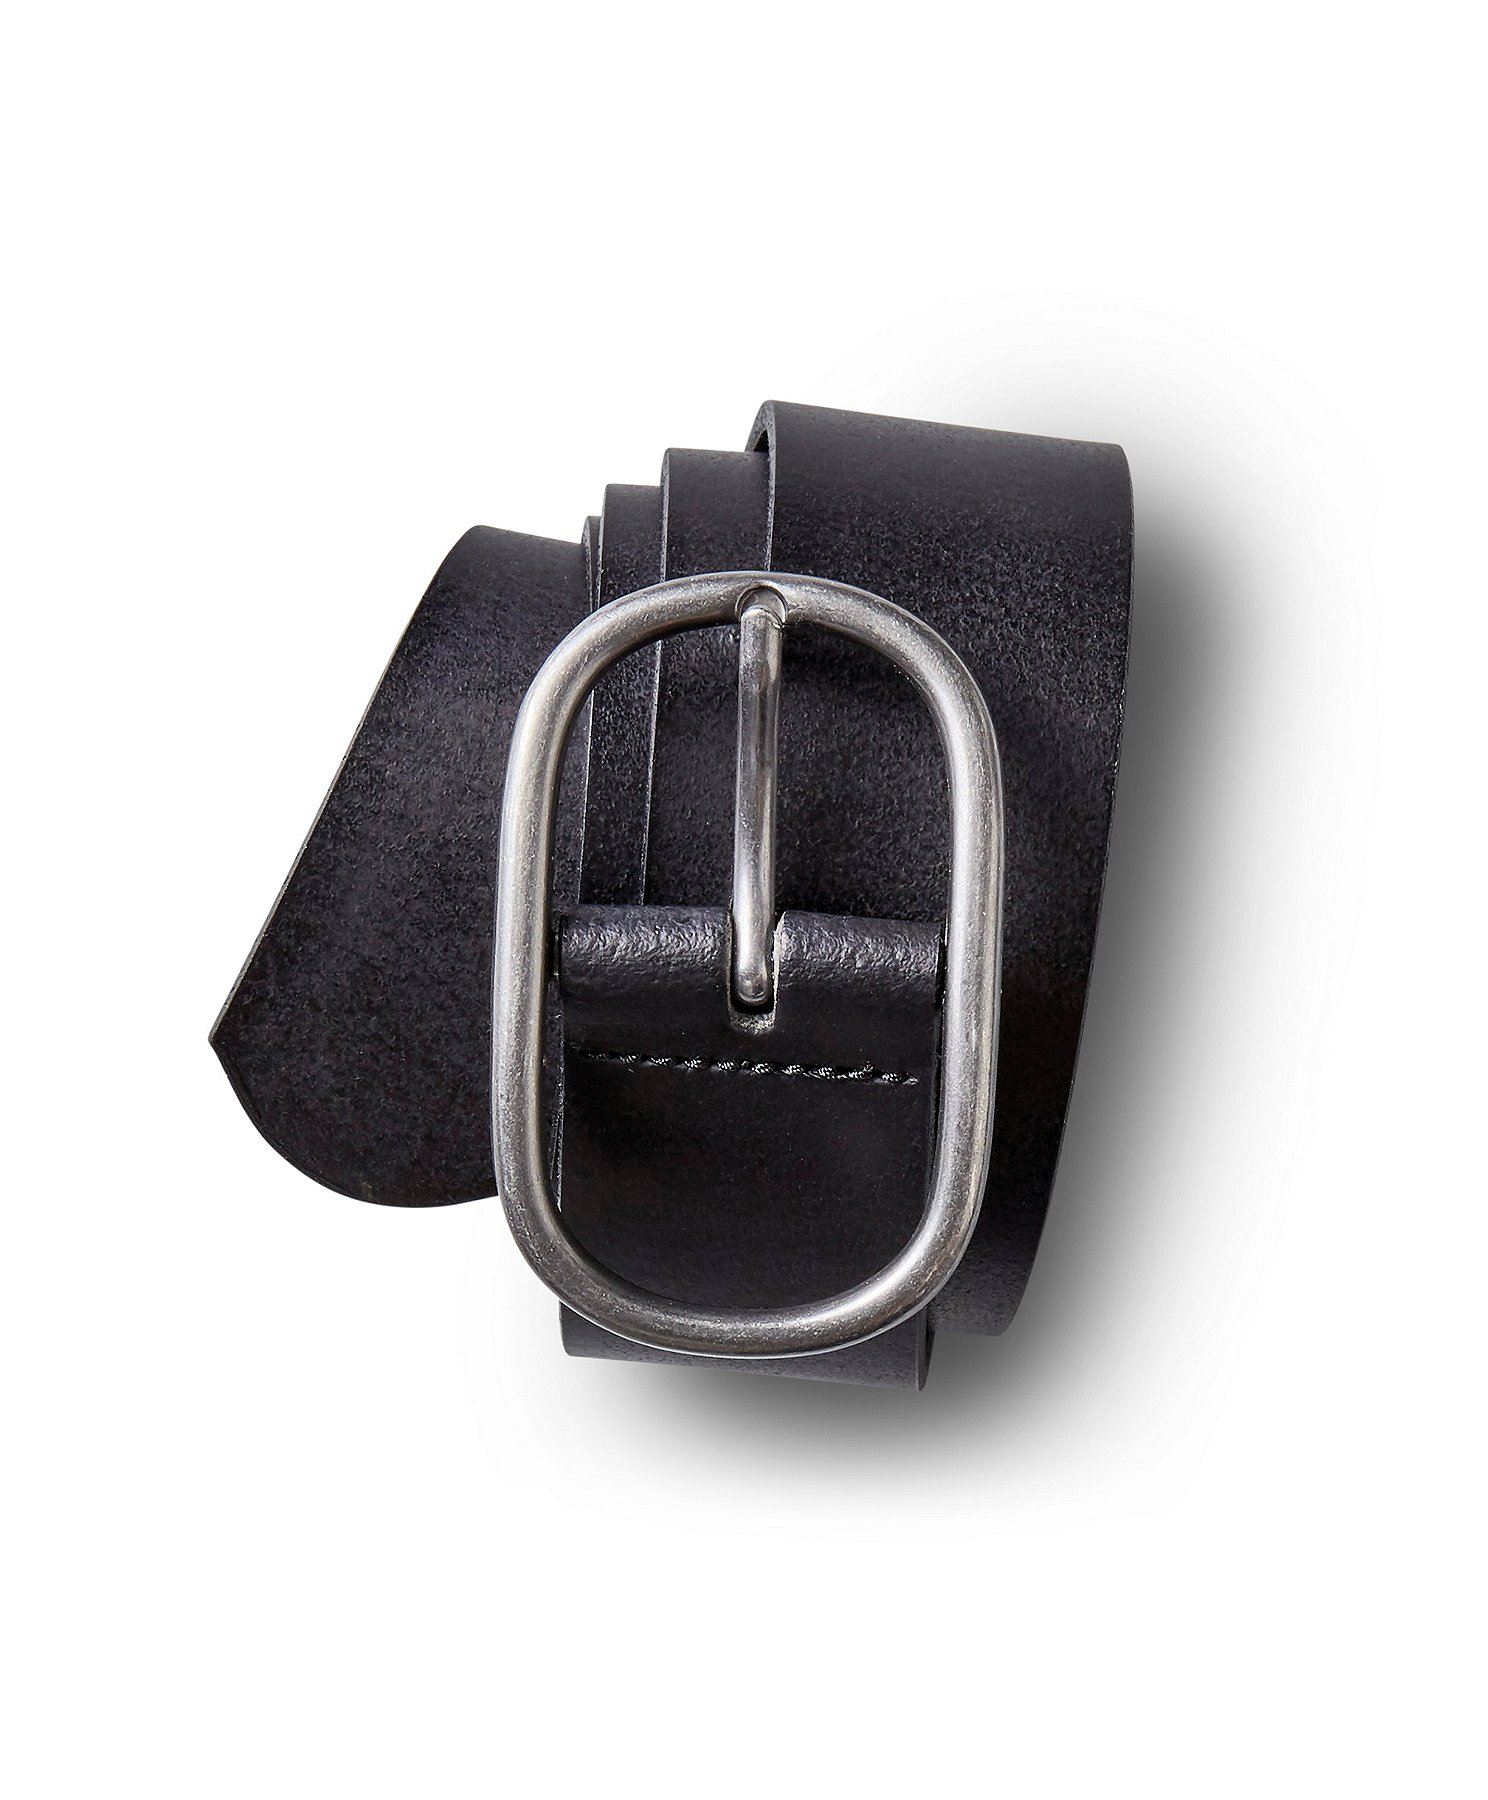 Men Fashion Belt Split Leather Italian Design Casual Jeans Buckle Accessories